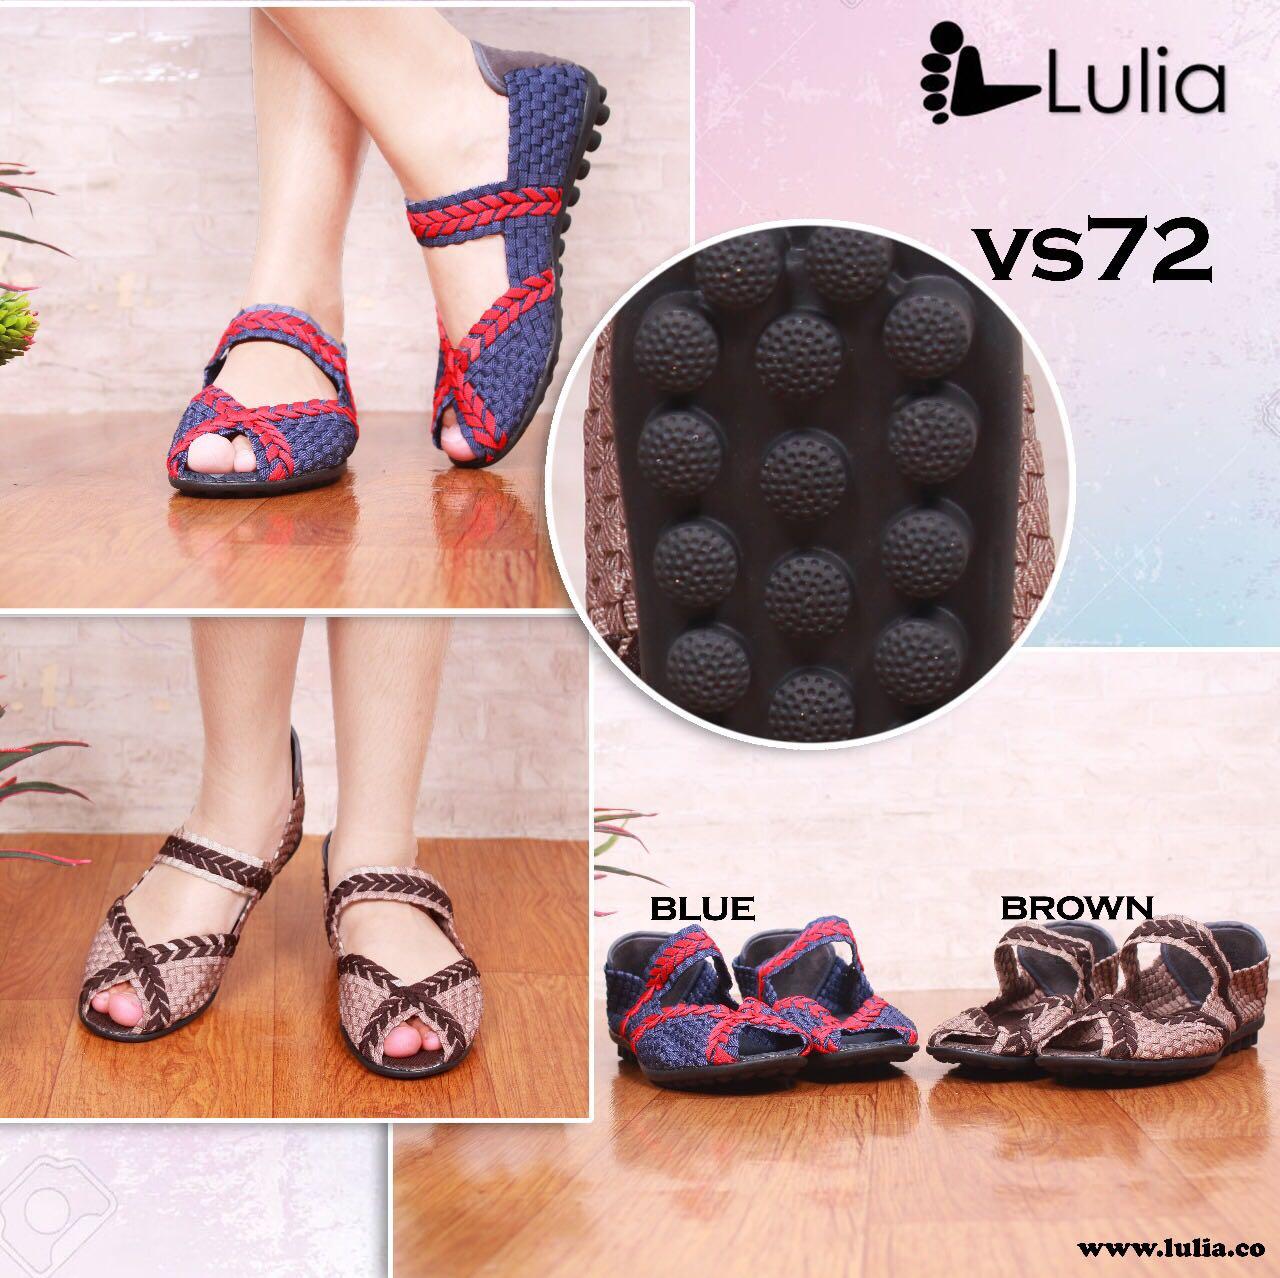 Sepatu Lulia Flat VS72